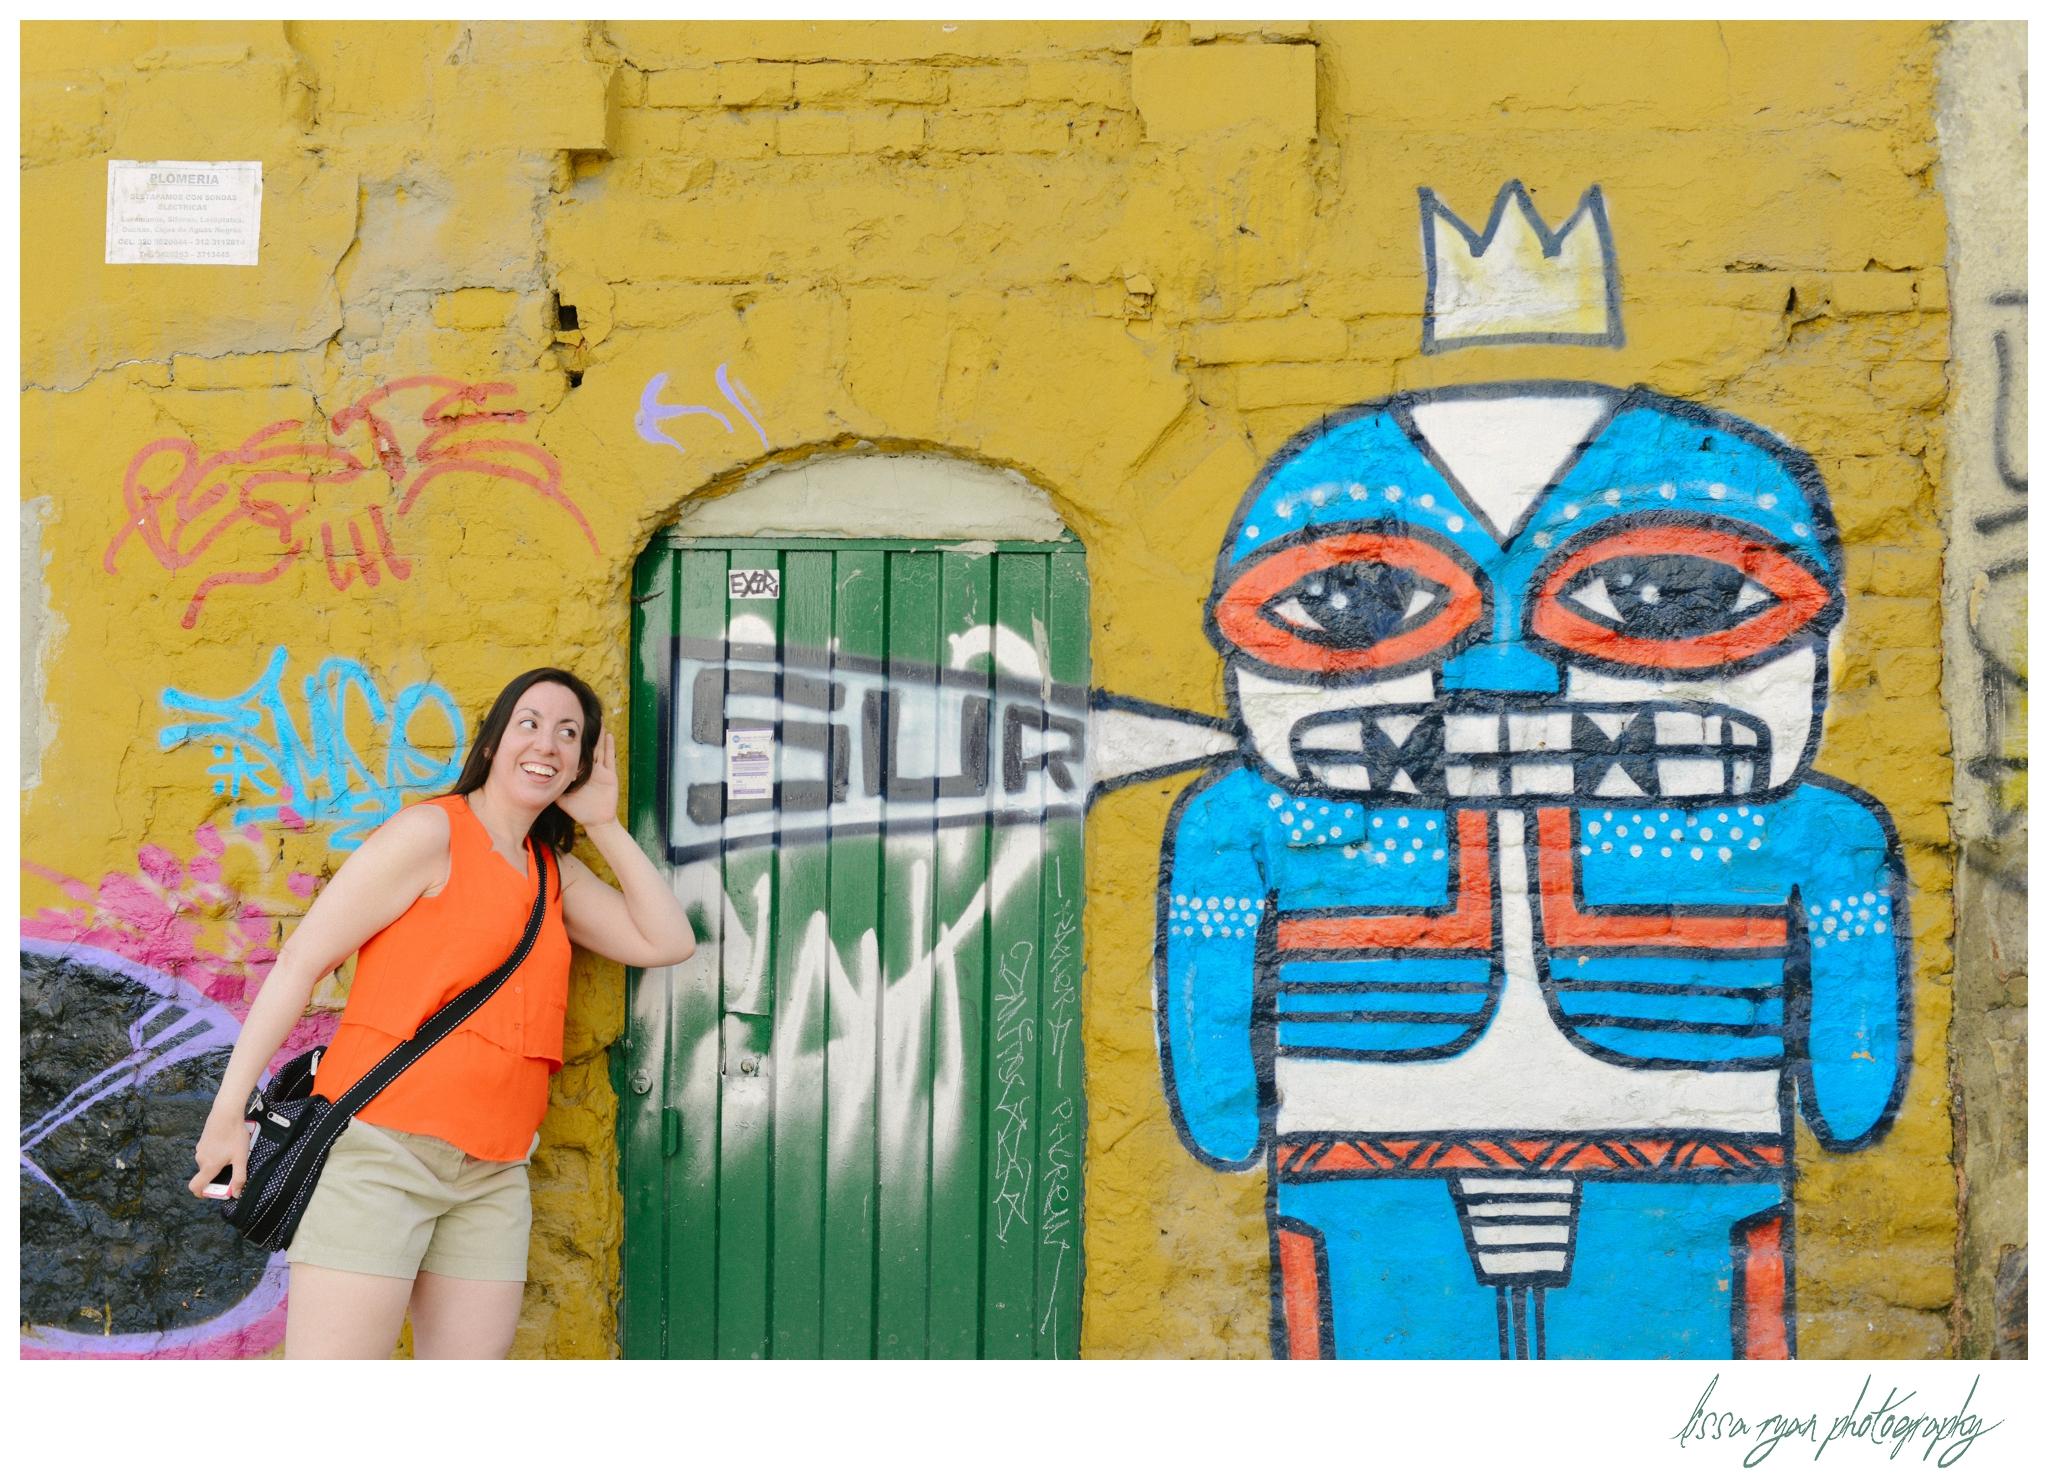 street art colombia bogota a-wandering wednesday travel photography lissa ryan photography